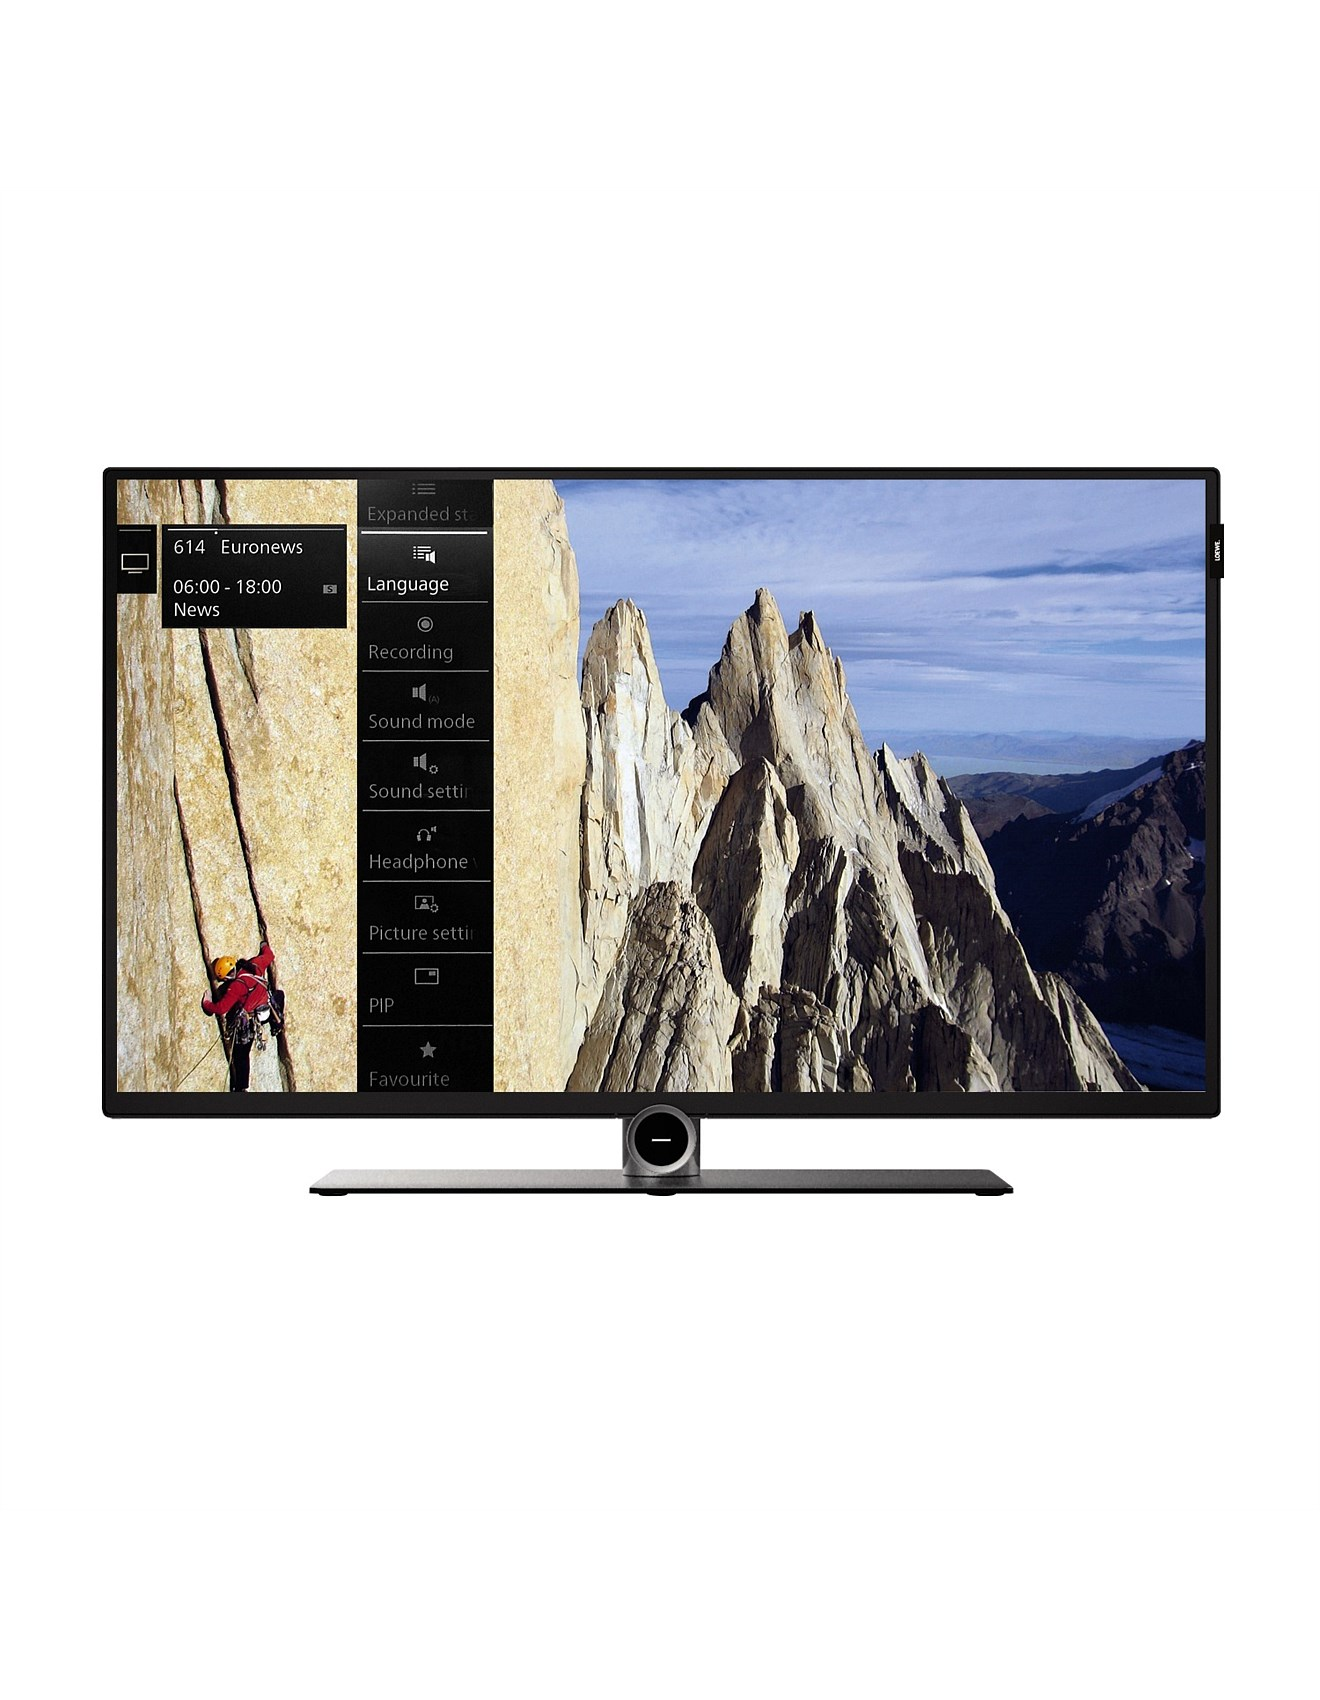 40 50 inch loewe bild fhd led smart tv with usb record. Black Bedroom Furniture Sets. Home Design Ideas